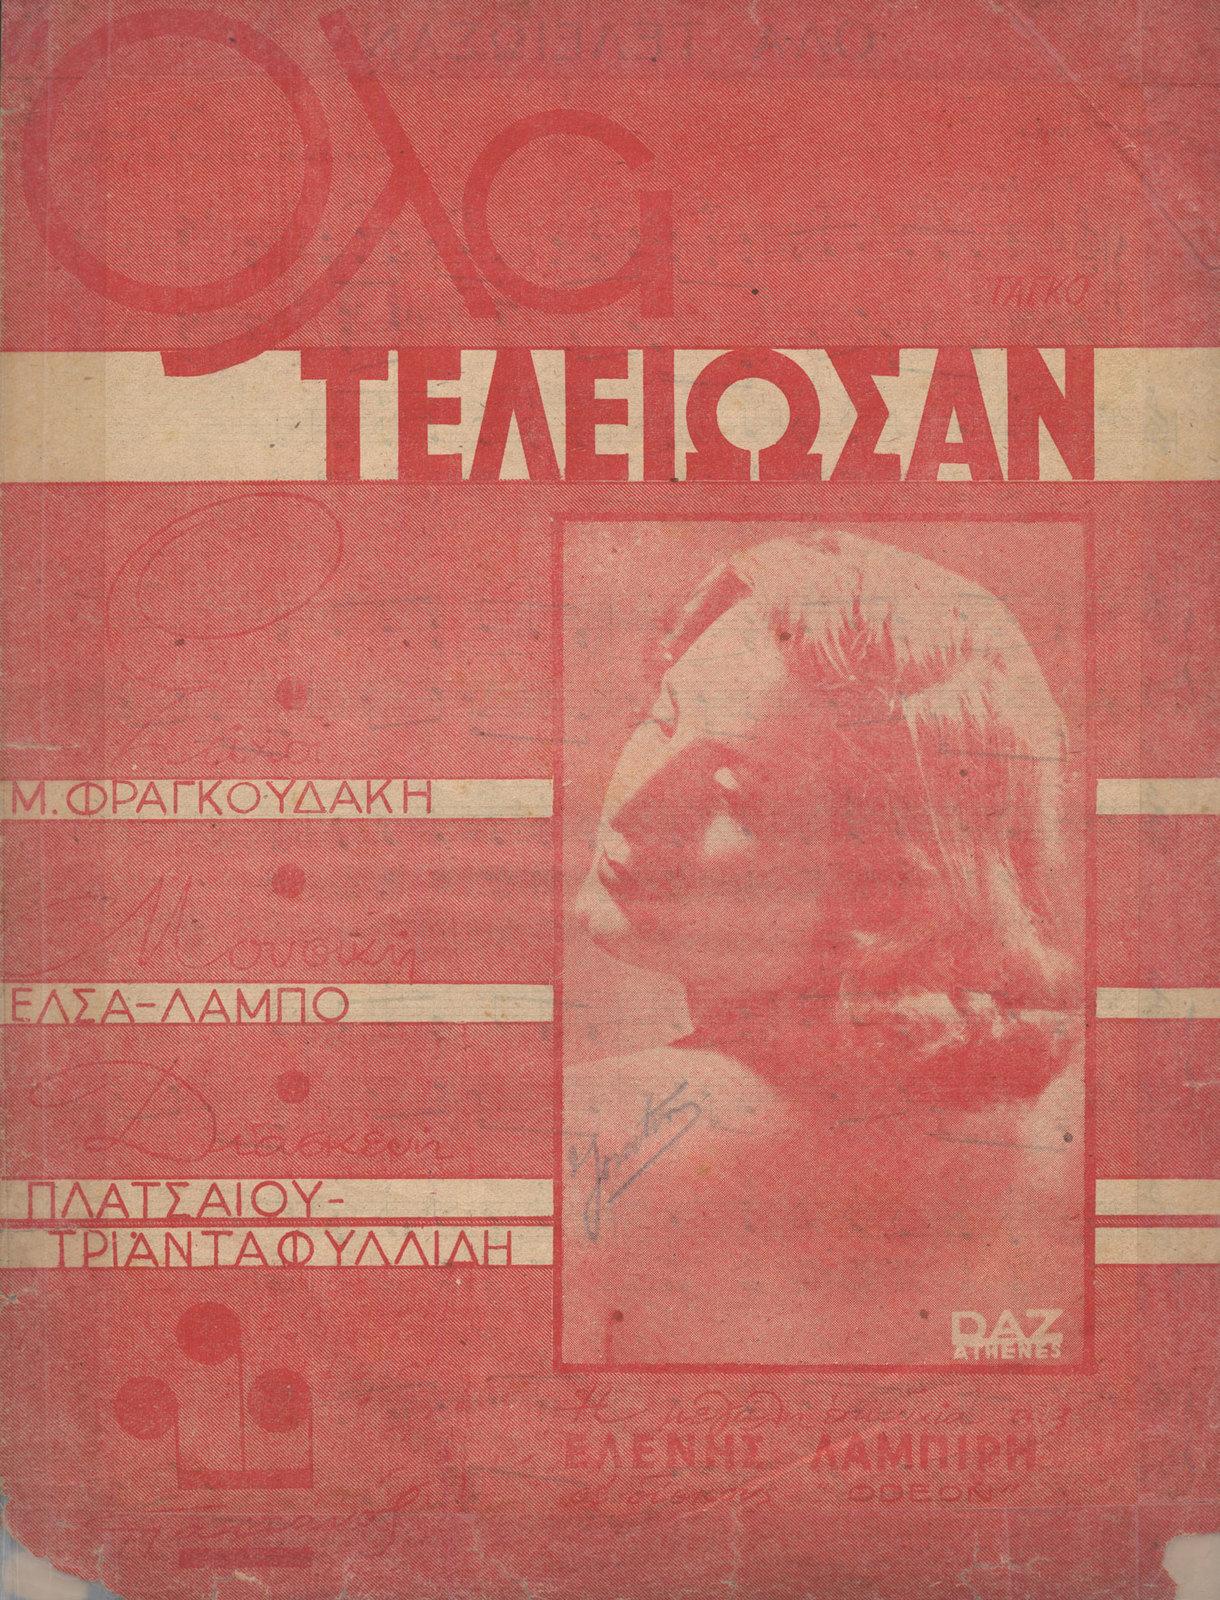 "[Ola teleiosan/ All finished], Lambiri, Eleni, Music Library of Greece ""Lilian Voudouri"" – Friends of Music Society, Public Domain Mark"